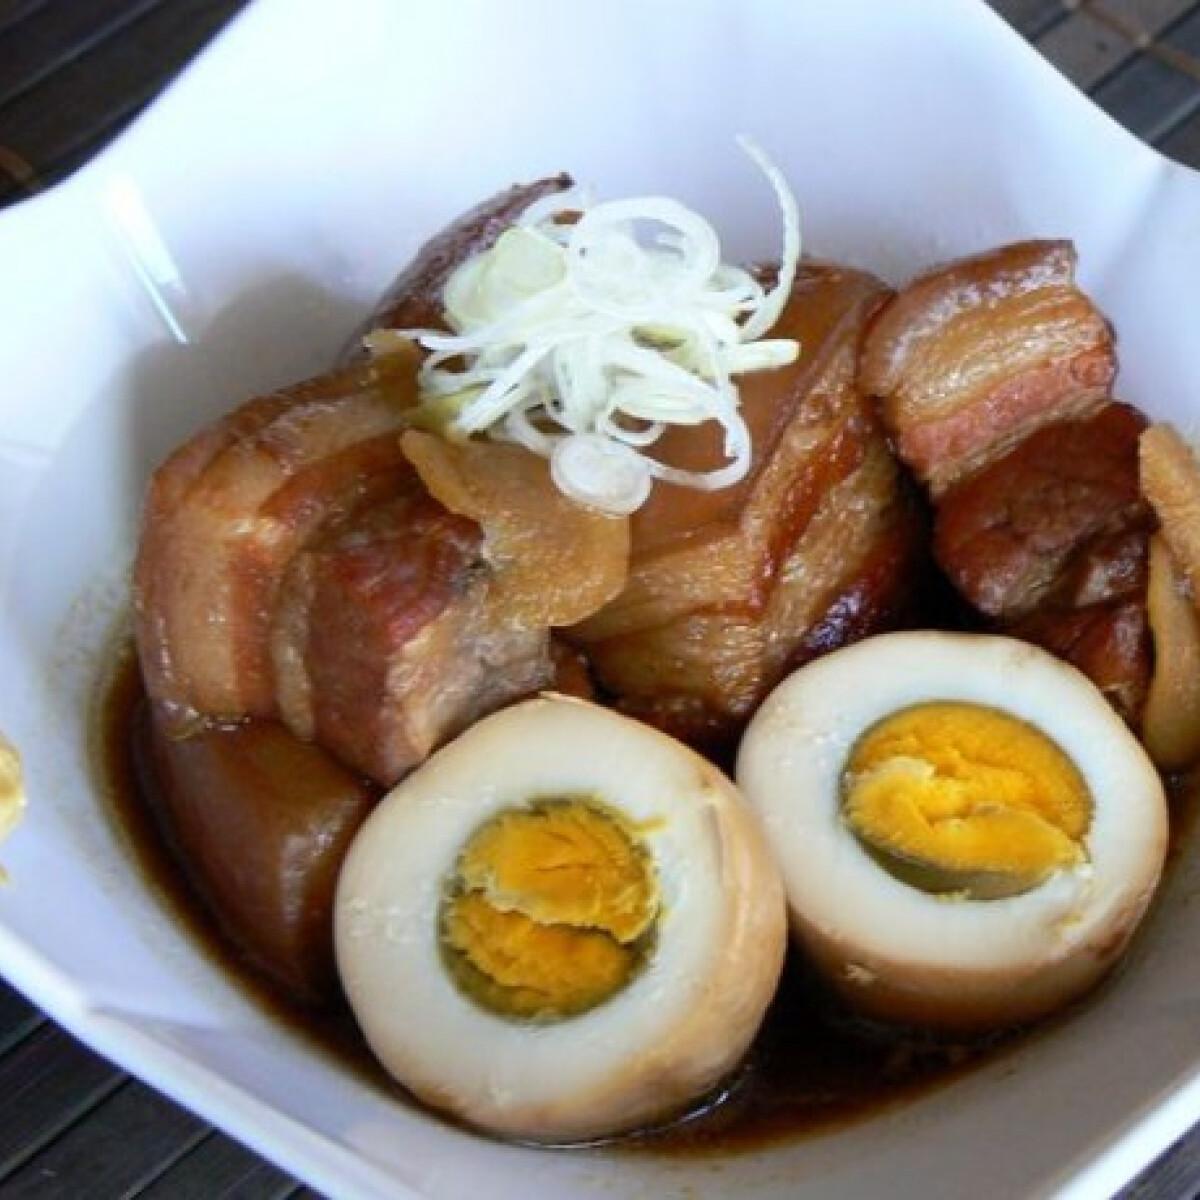 Ezen a képen: Buta no kakuni